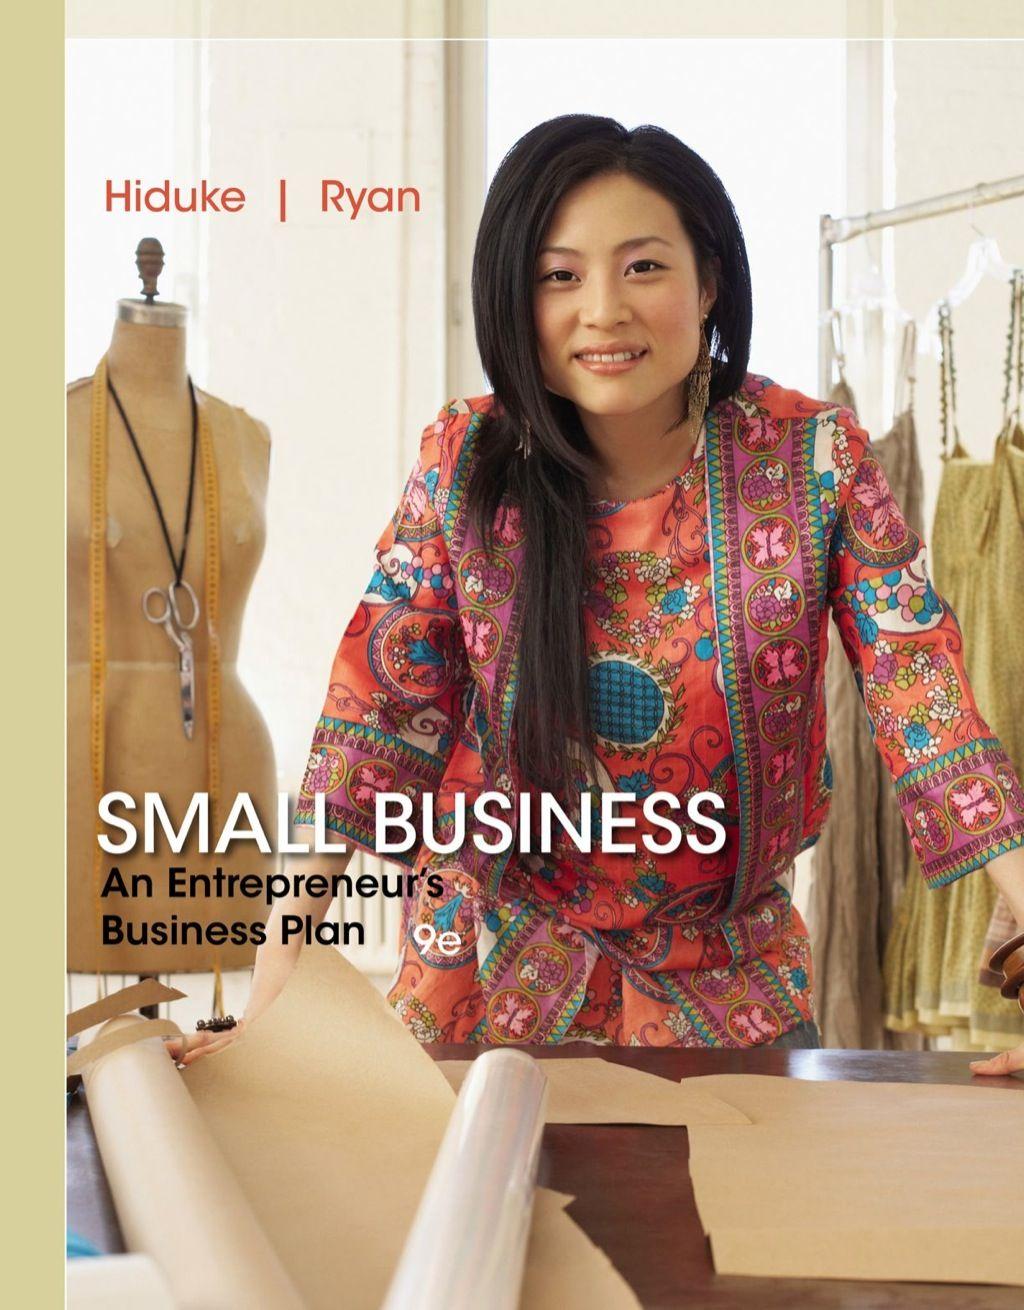 Small Business An Entrepreneur's Business Plan (eBook